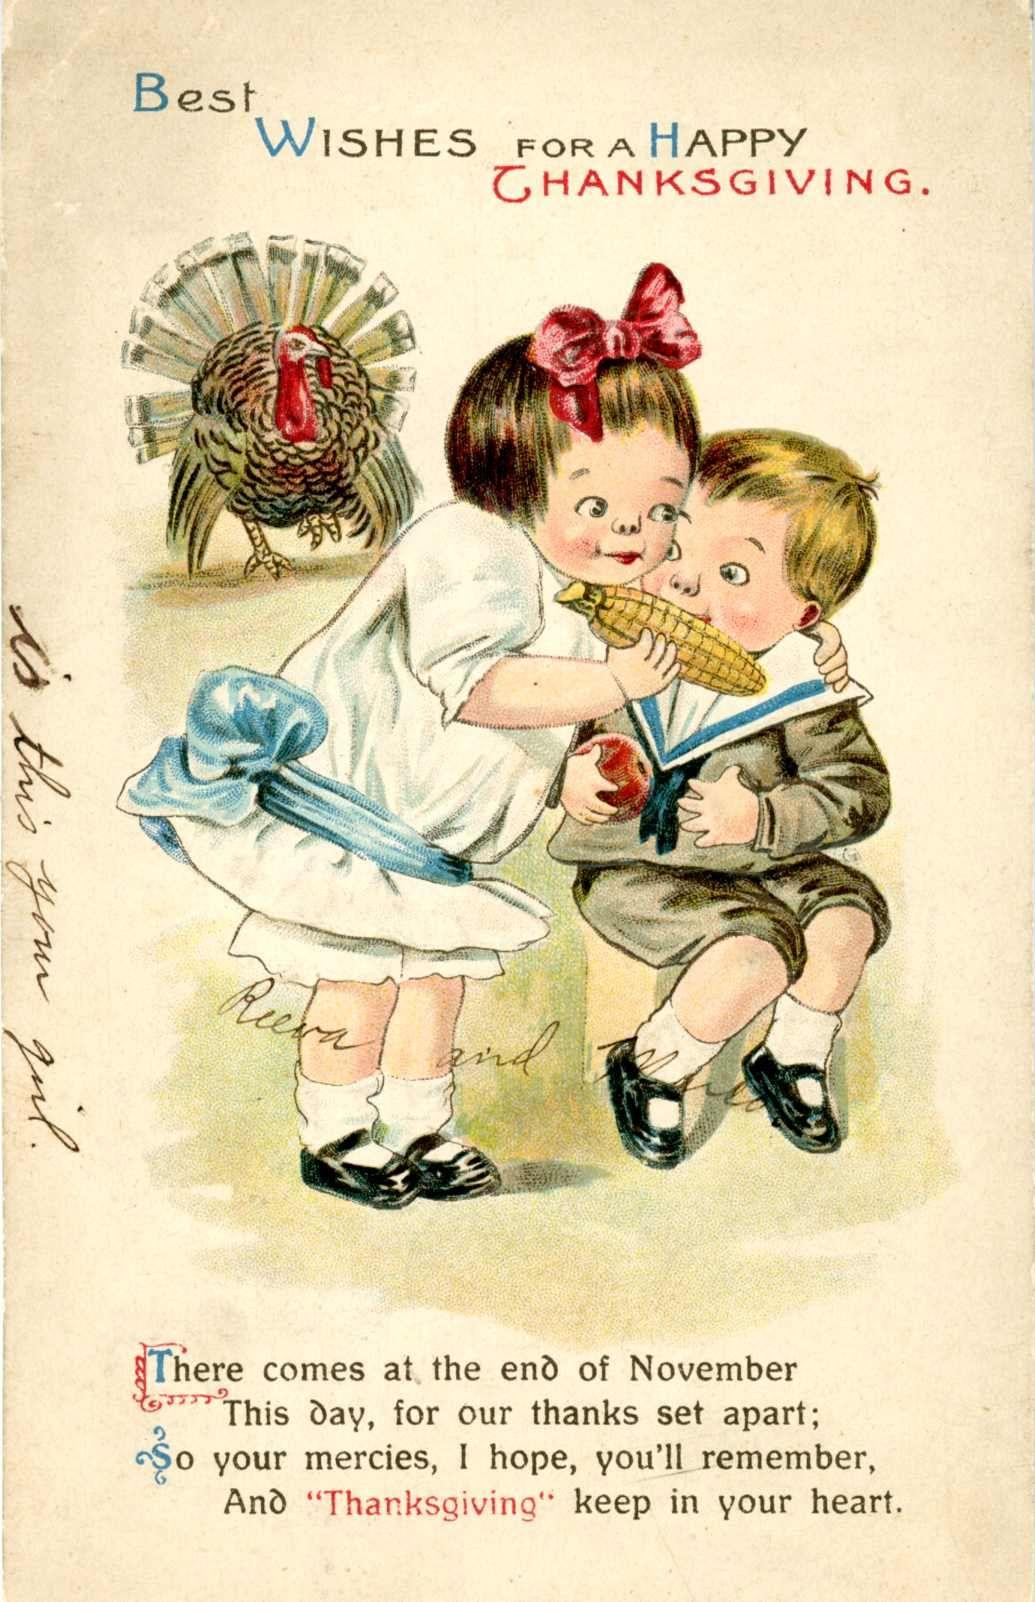 1916 postcard. Hagins collection.